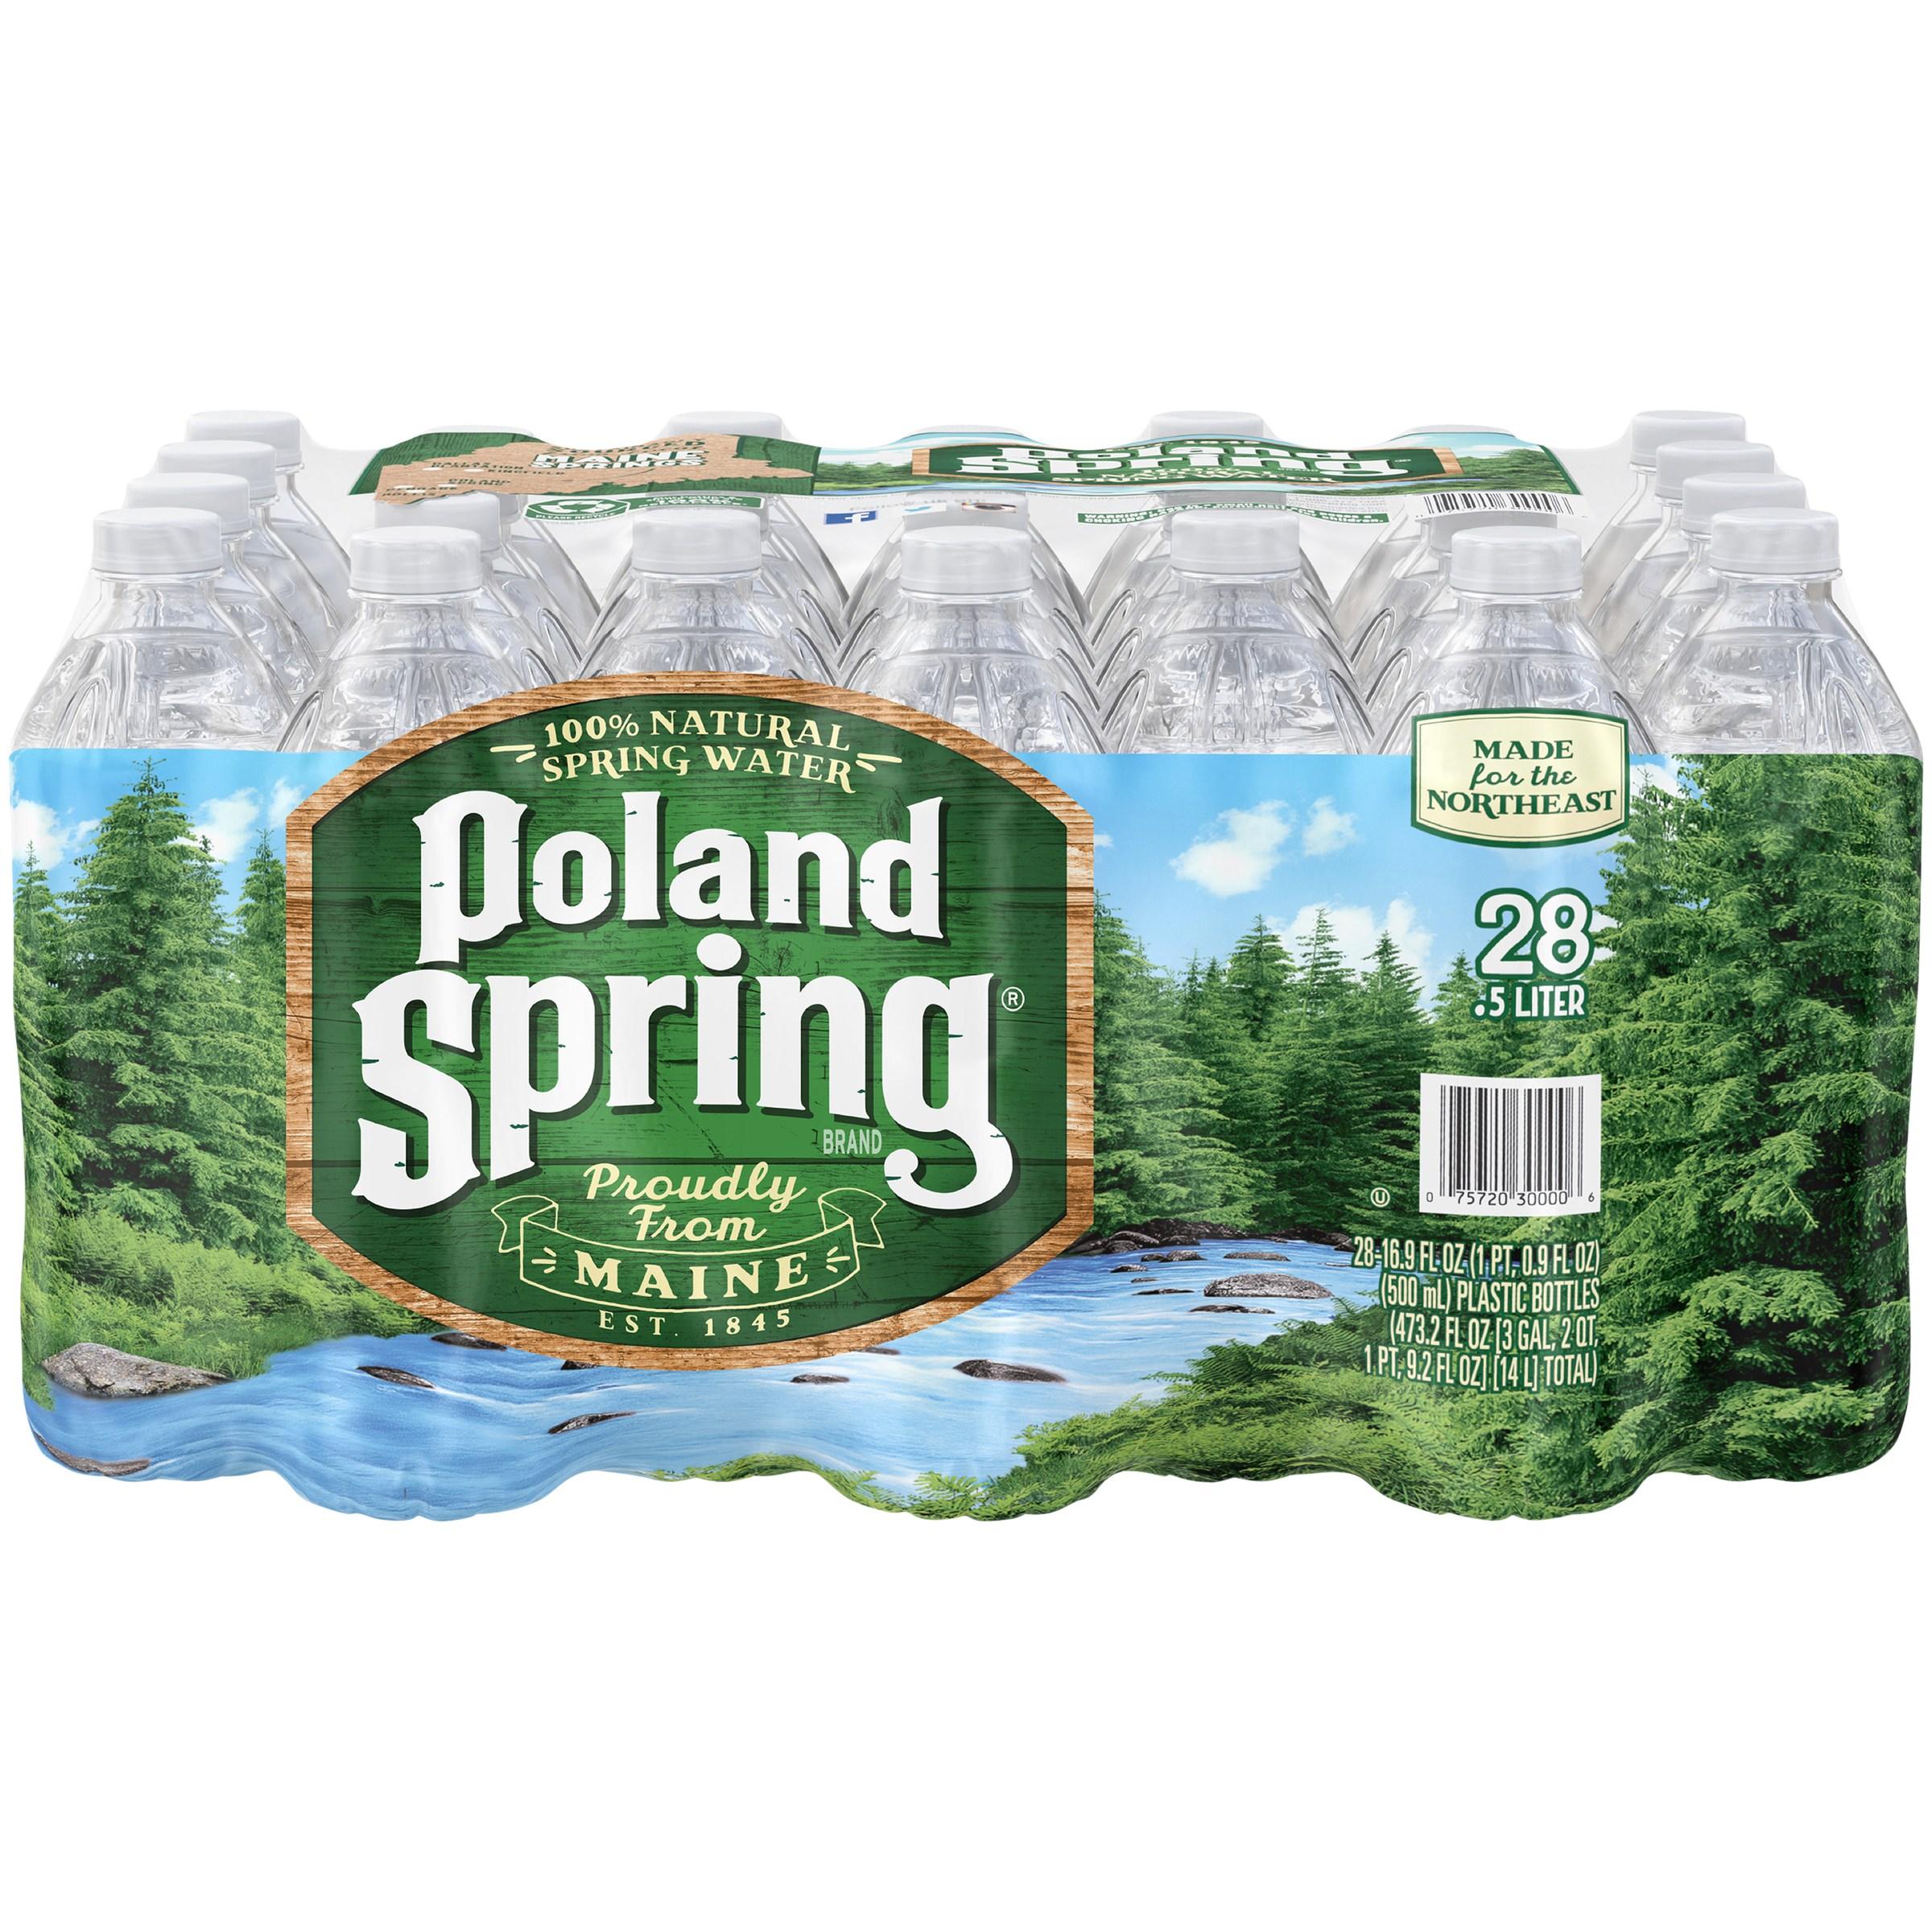 Poland Spring Natural Spring Water, 16.9 Fl. Oz., 28 Count